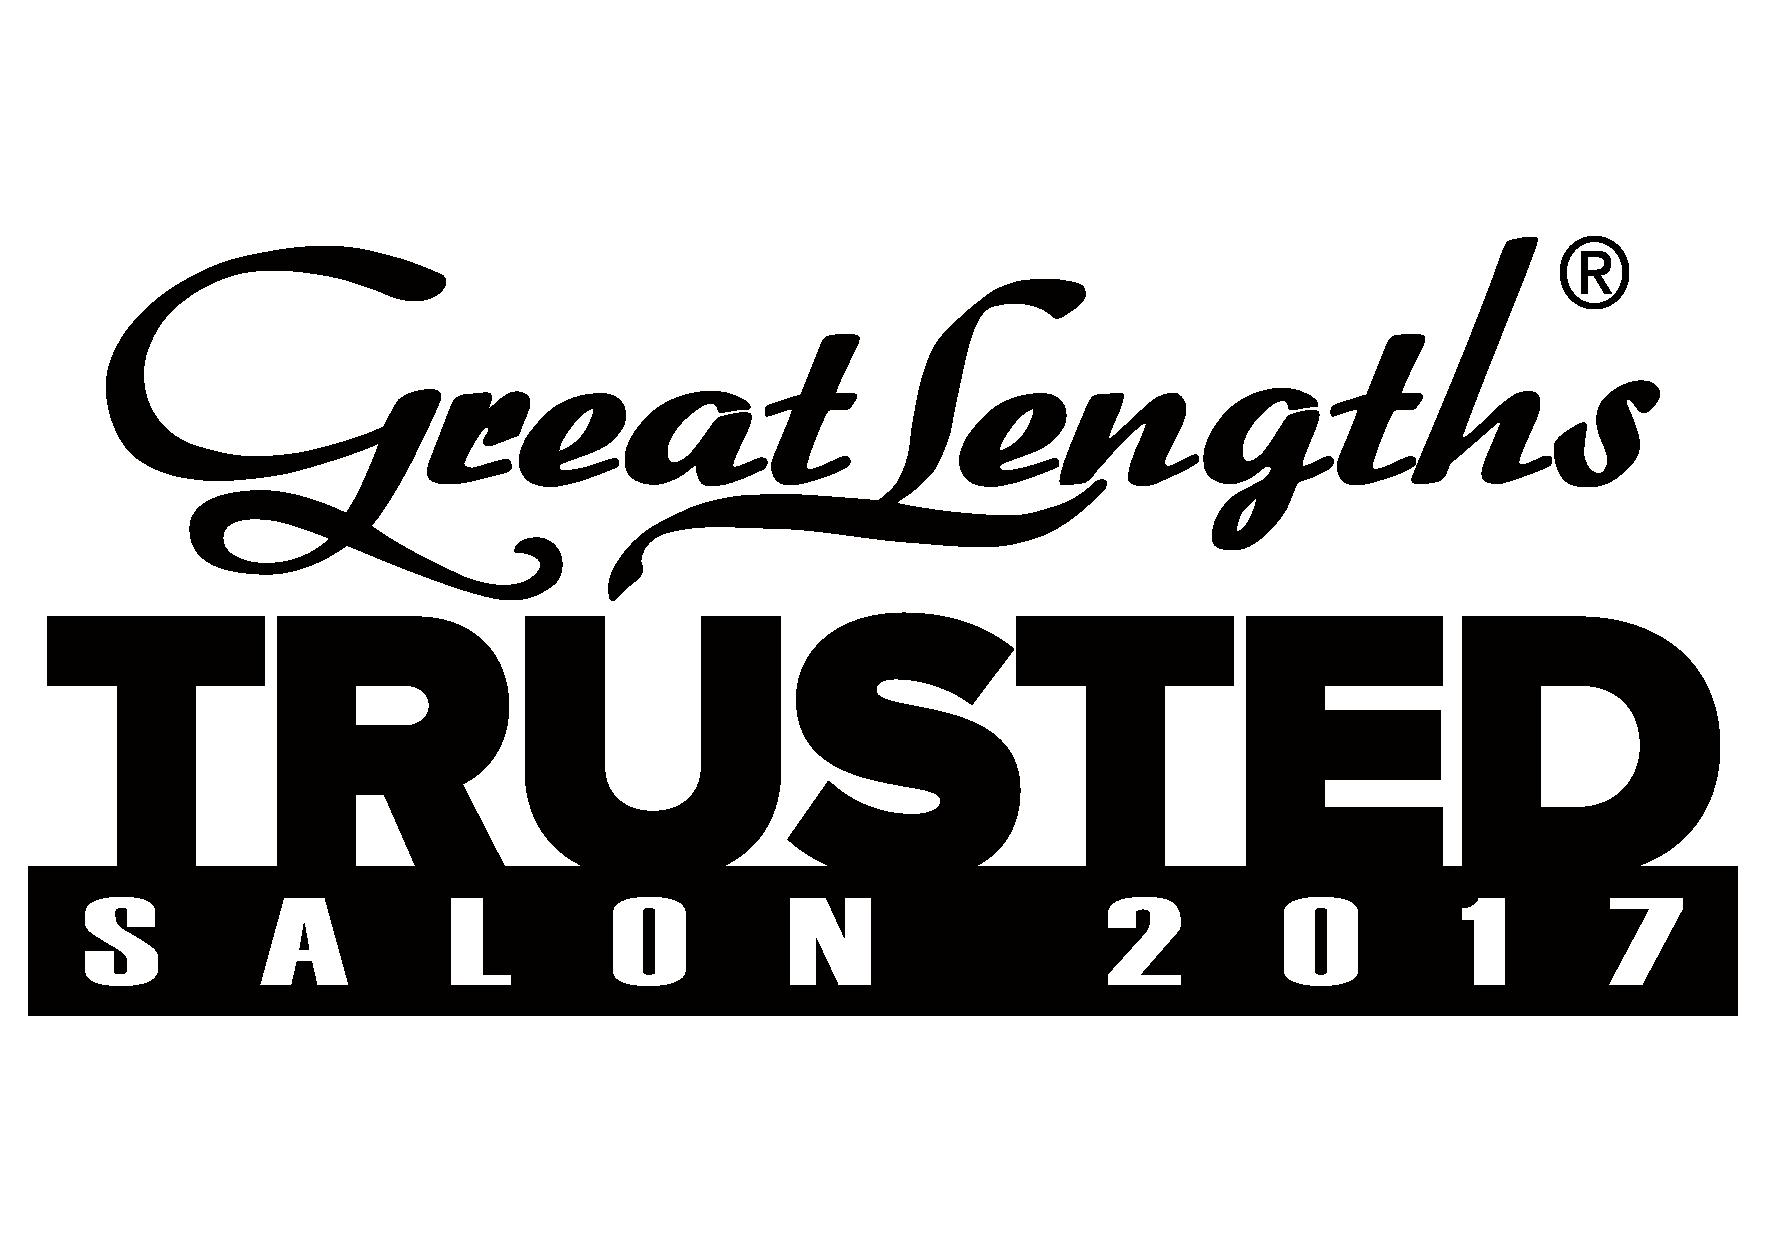 Trusted kapsalon - Kwaliteitslabel - Hairextensions - Haar verlengen - Hairstation - Rumst -  Antwerpen - Mechelen - Lier - Puurs